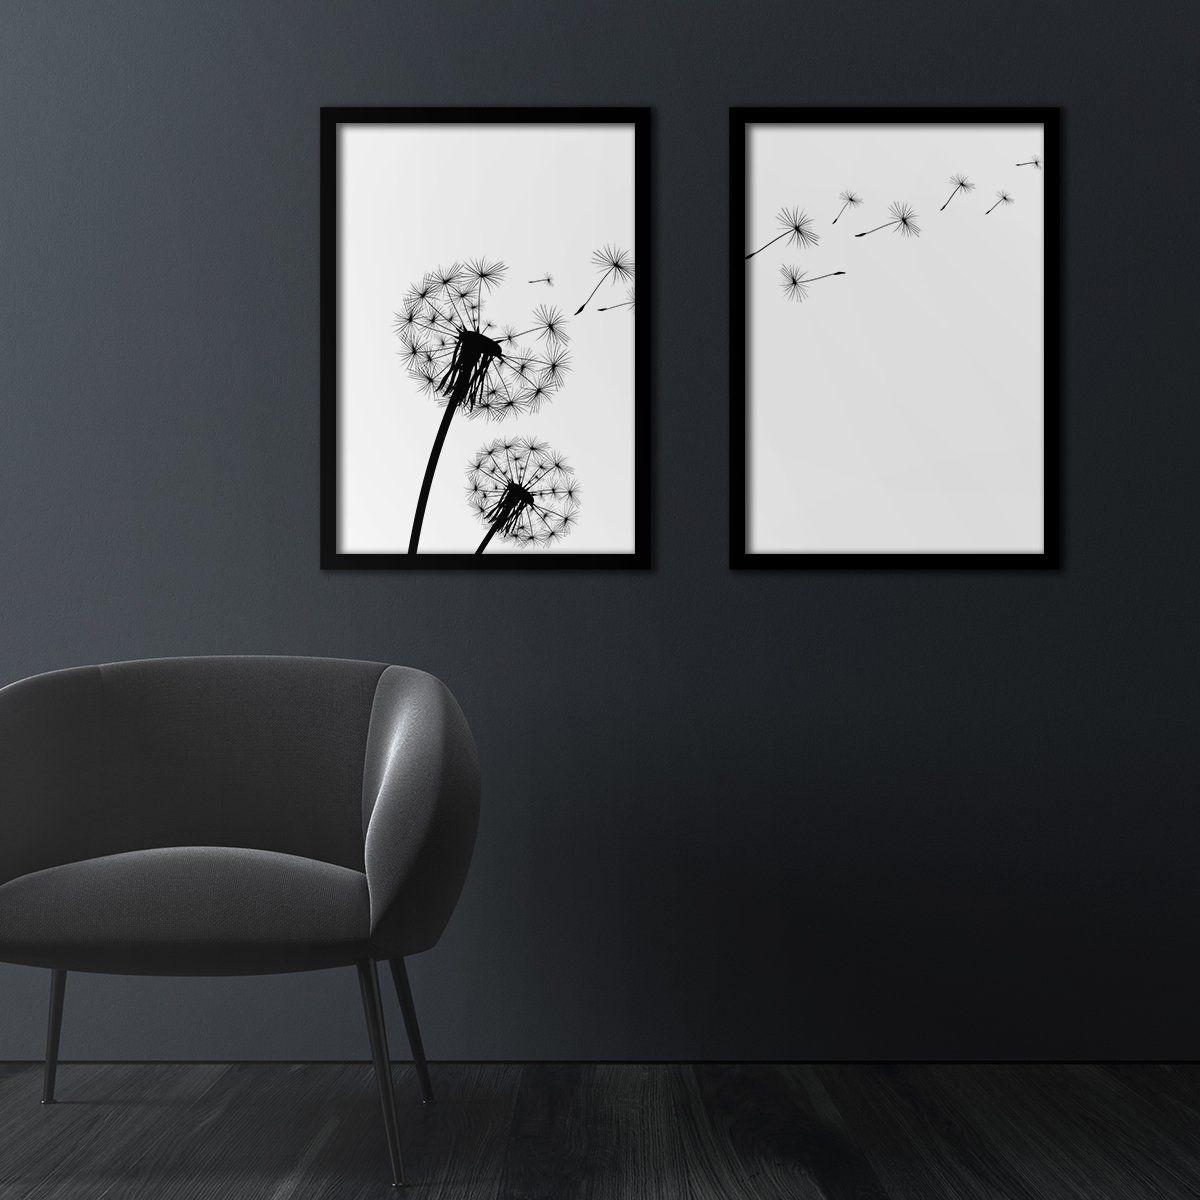 Silver Ares Dandelion Poster Set